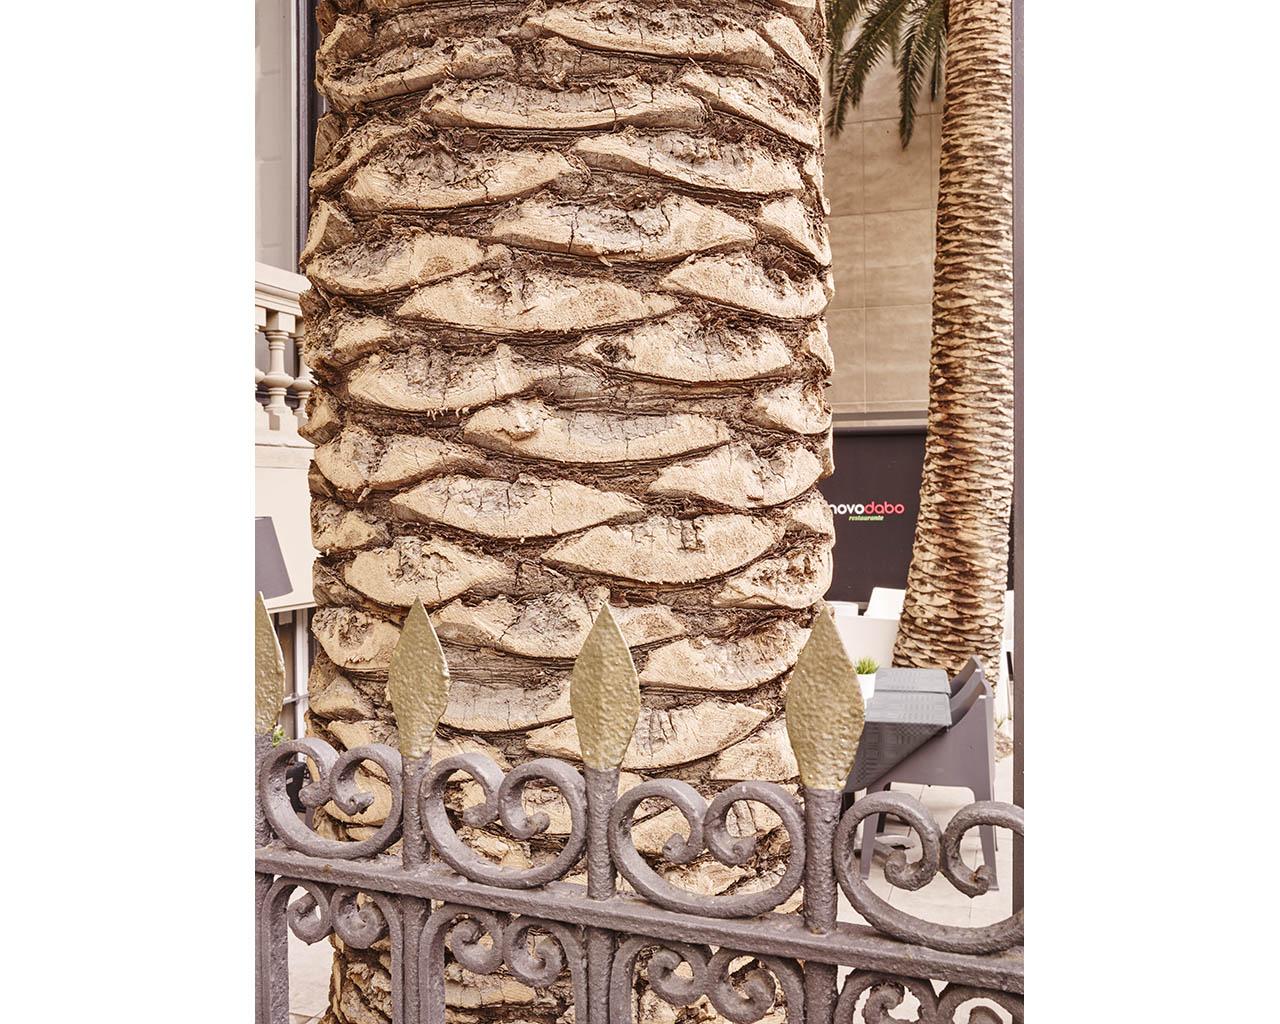 Novodabo-palmera-terraza